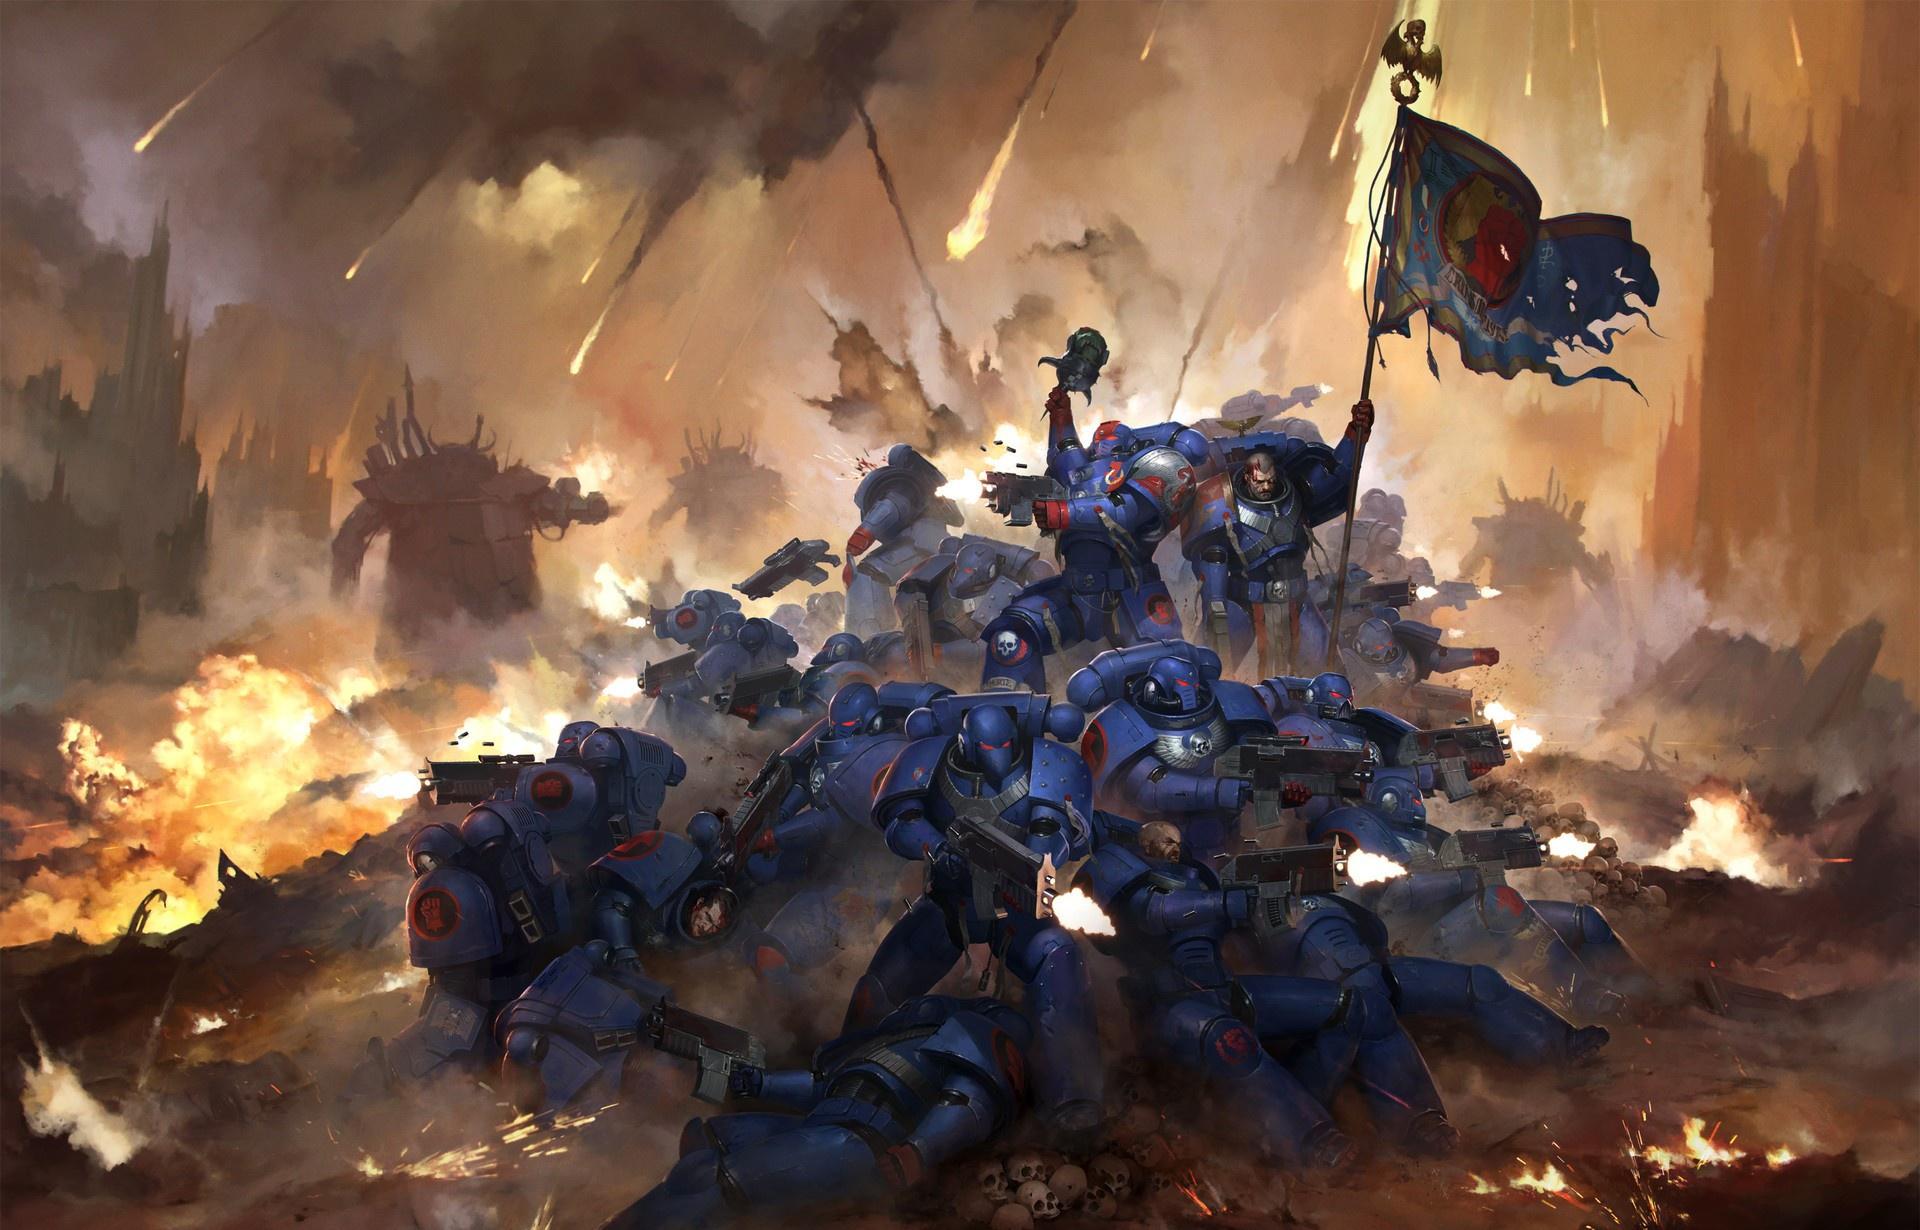 Warhammer 40k Hd Wallpaper Background Image 1920x1230 Id